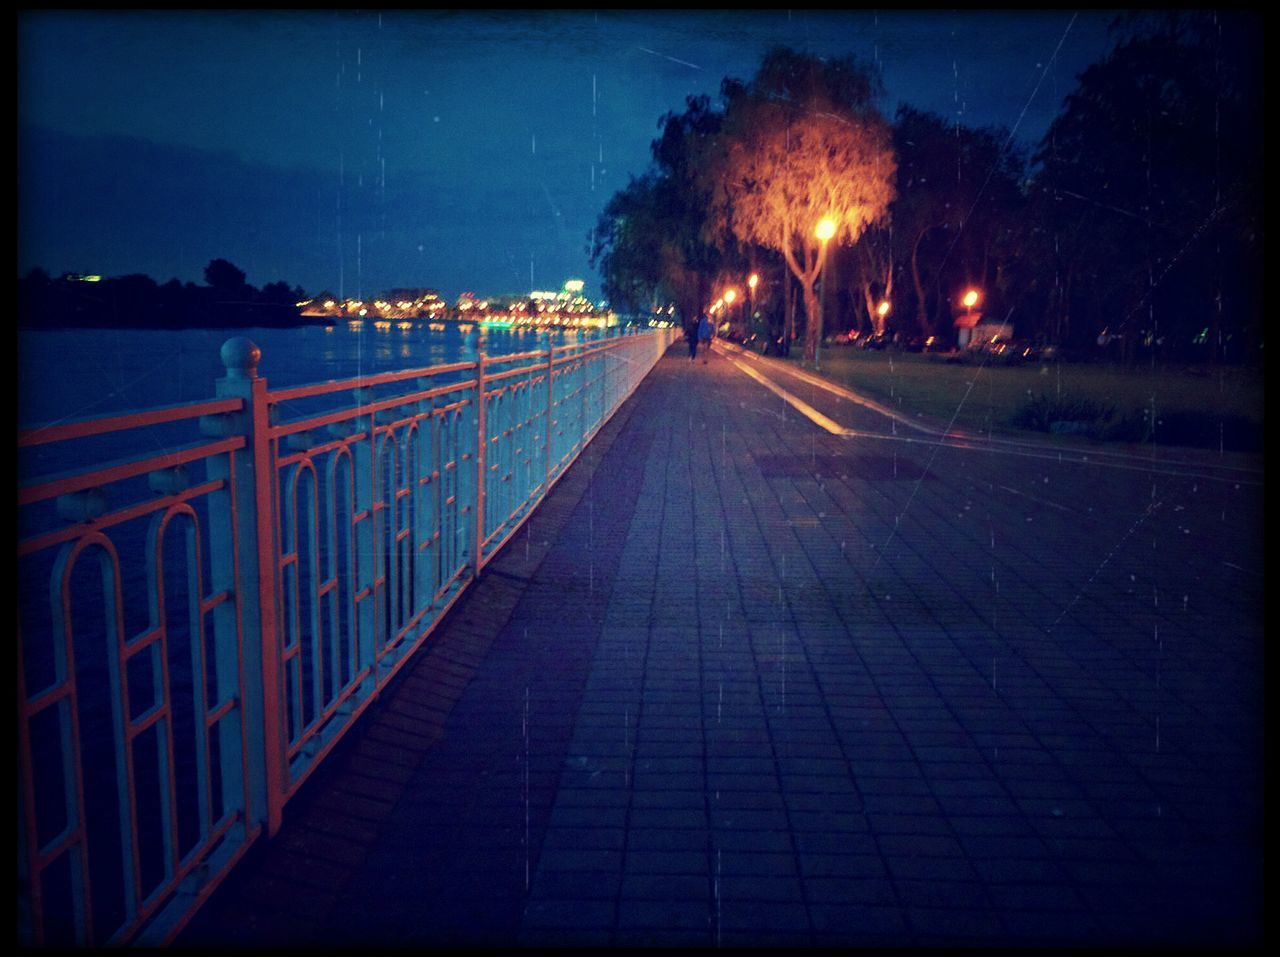 Like Sunset Lumen Light Krasnodar Russia фотография свет свежийвоздух